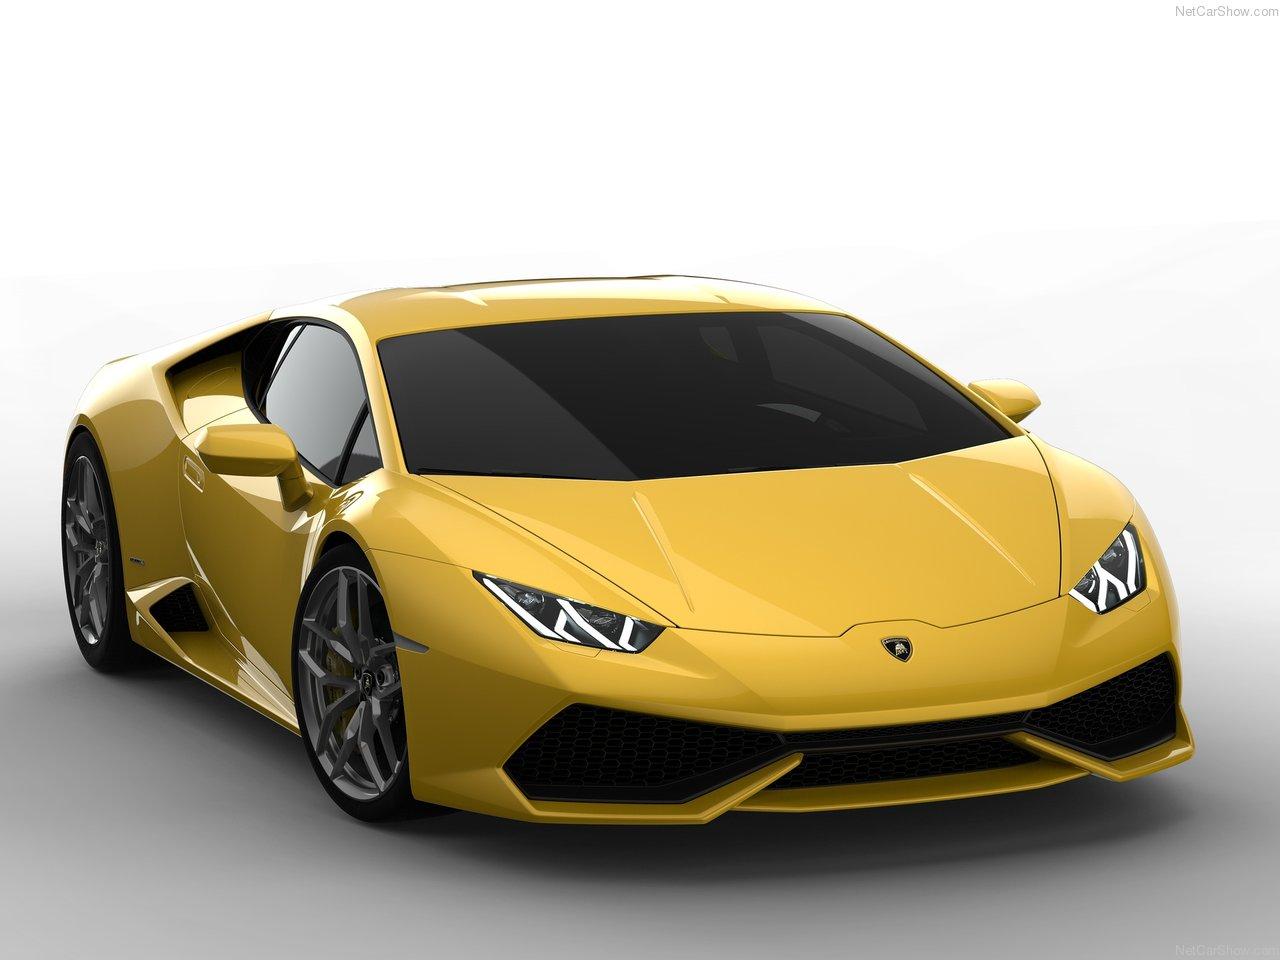 Lamborghini-Huracan_LP610-4_2015_1280x960_wallpaper_01.jpg